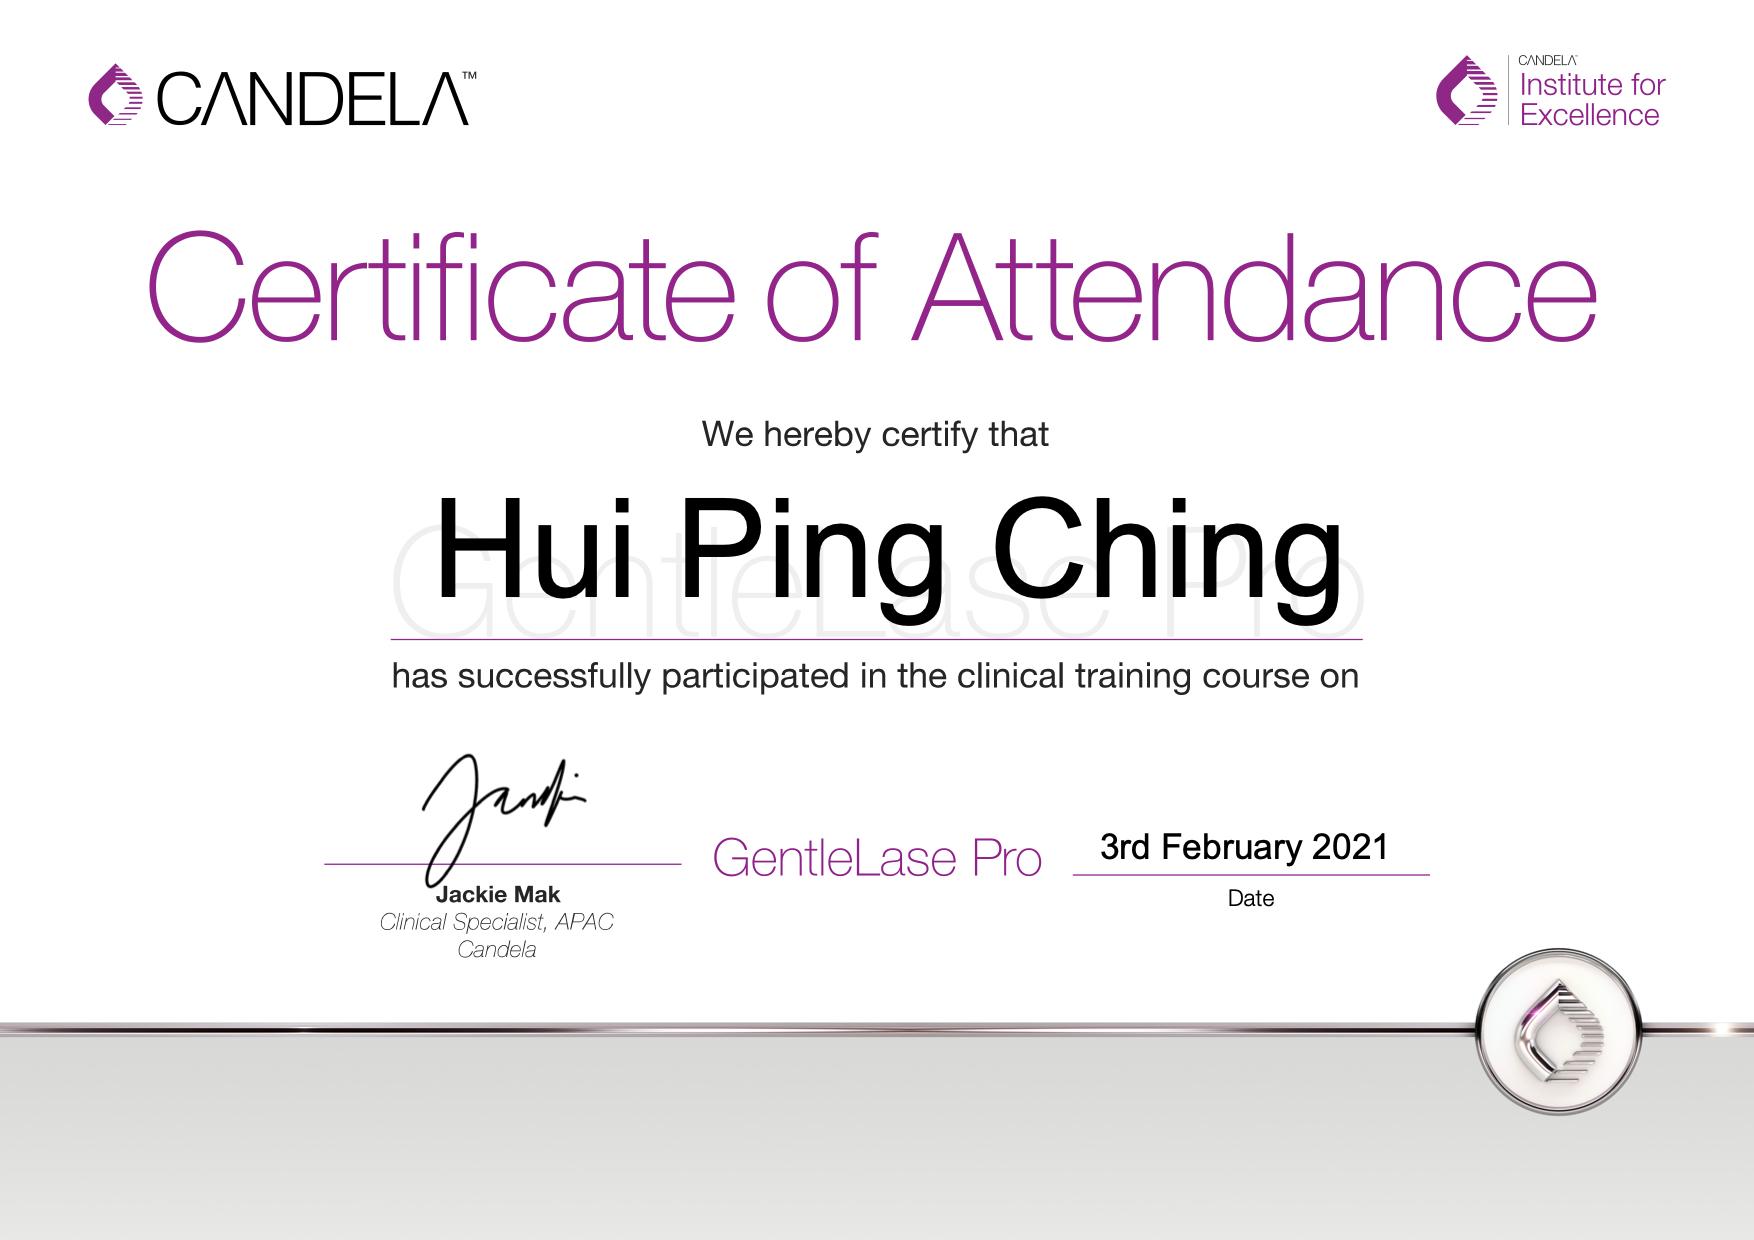 GentleLase_Pro_Certifcate_HuiPingChingYanis